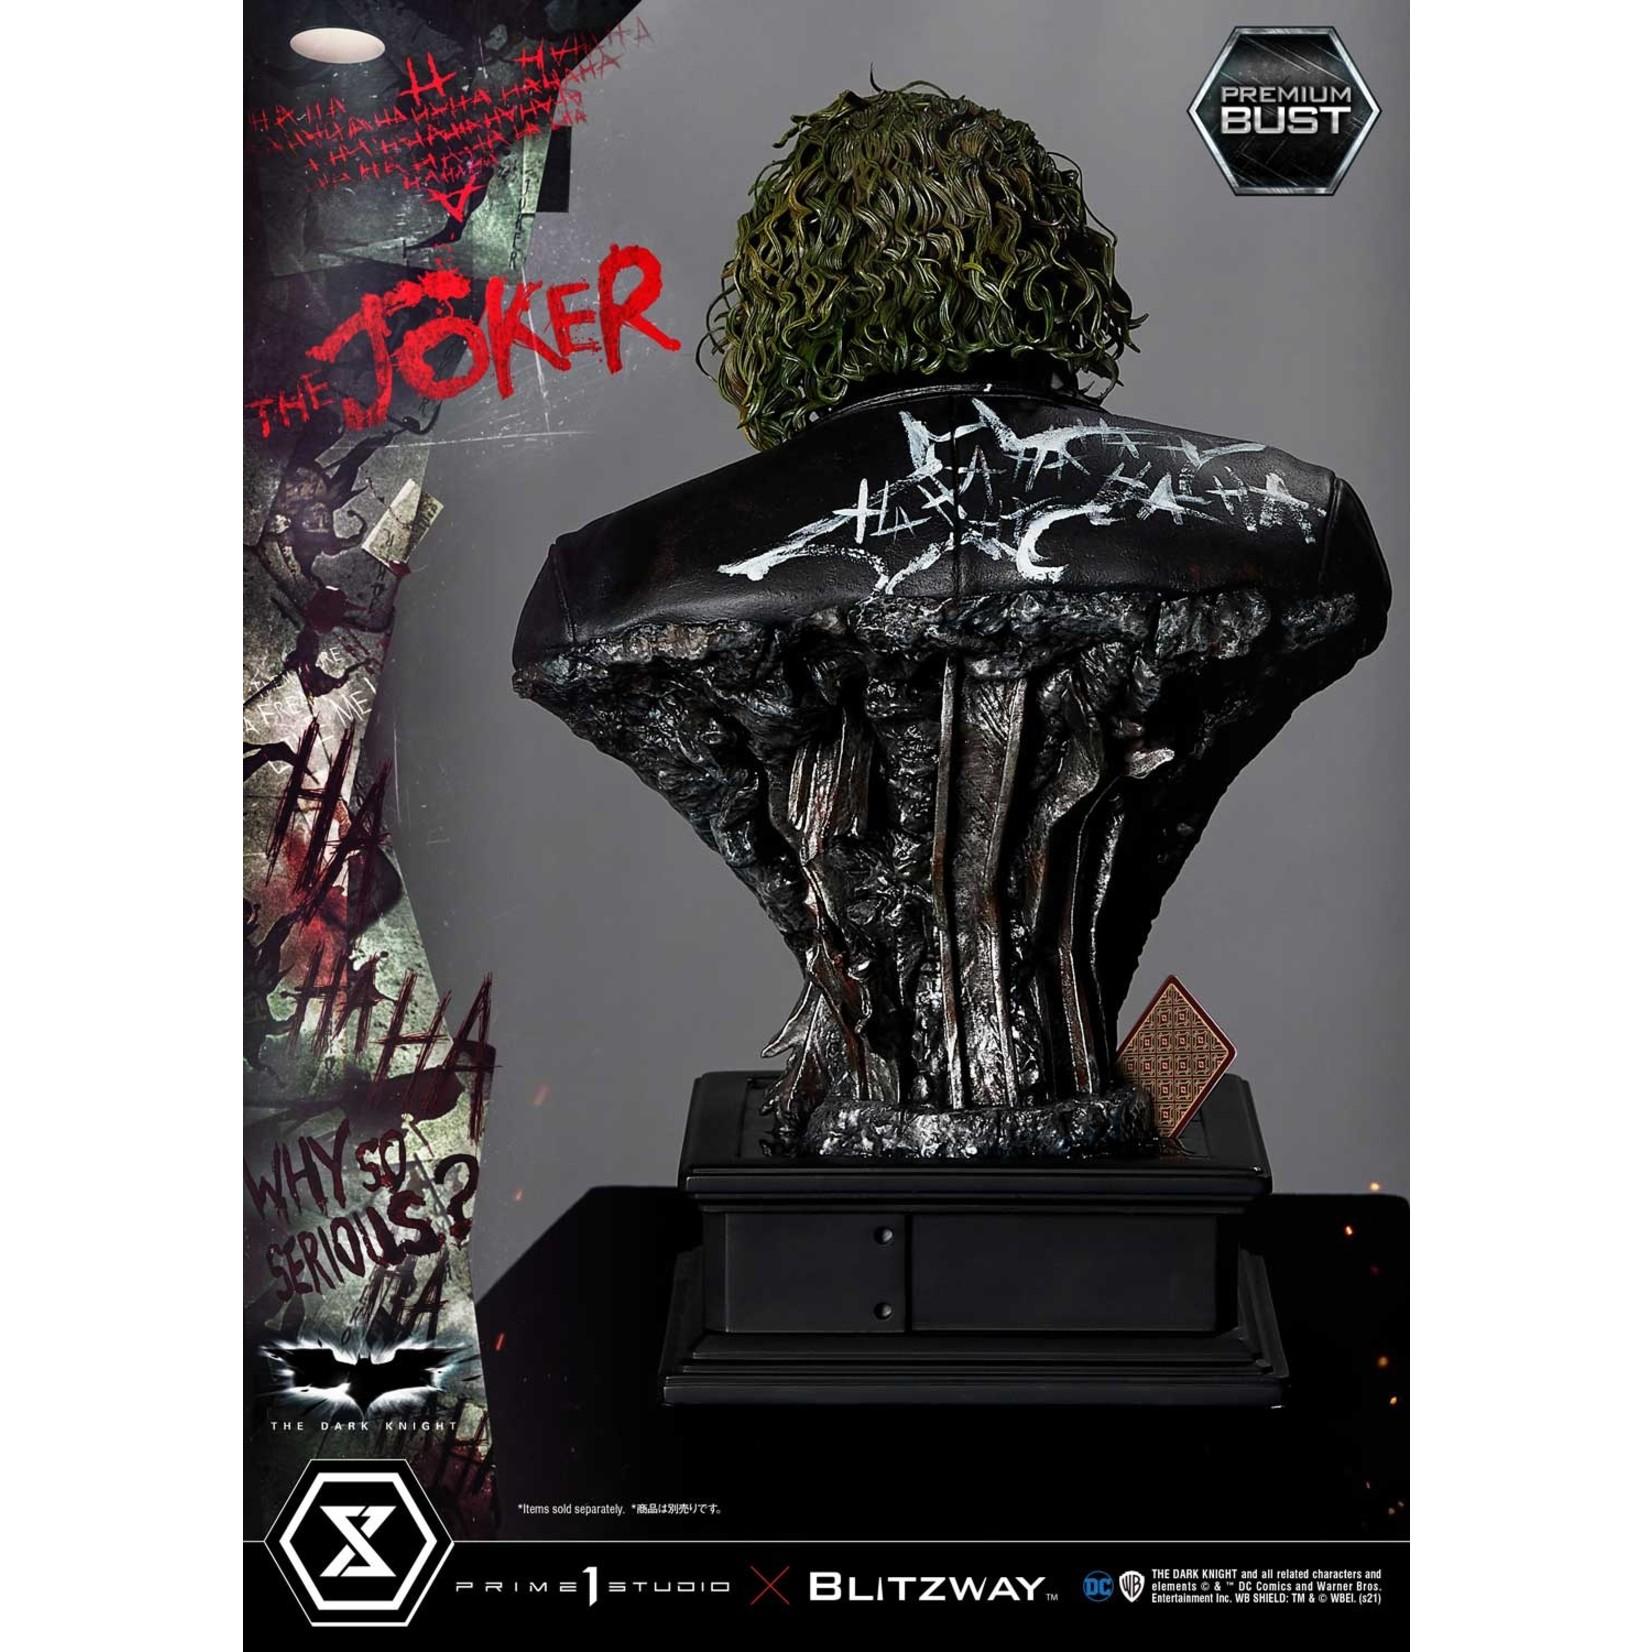 Prime 1 Studio [Preorder] Prime 1 X Blitzway - 1/3 scale THE JOKER BUST (THE DARK KNIGHT)